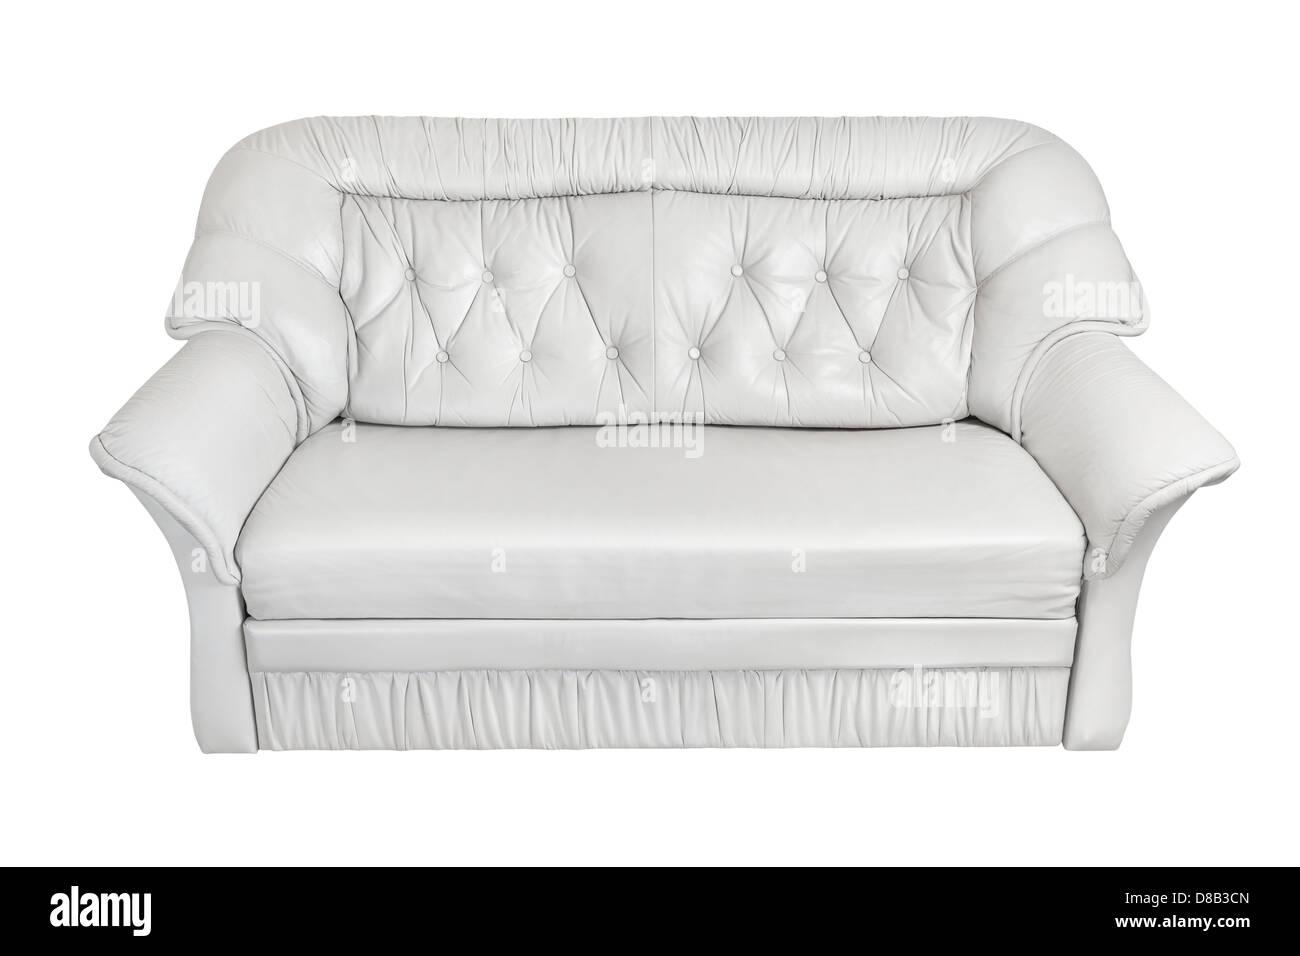 sofa leather white on white background - Stock Image